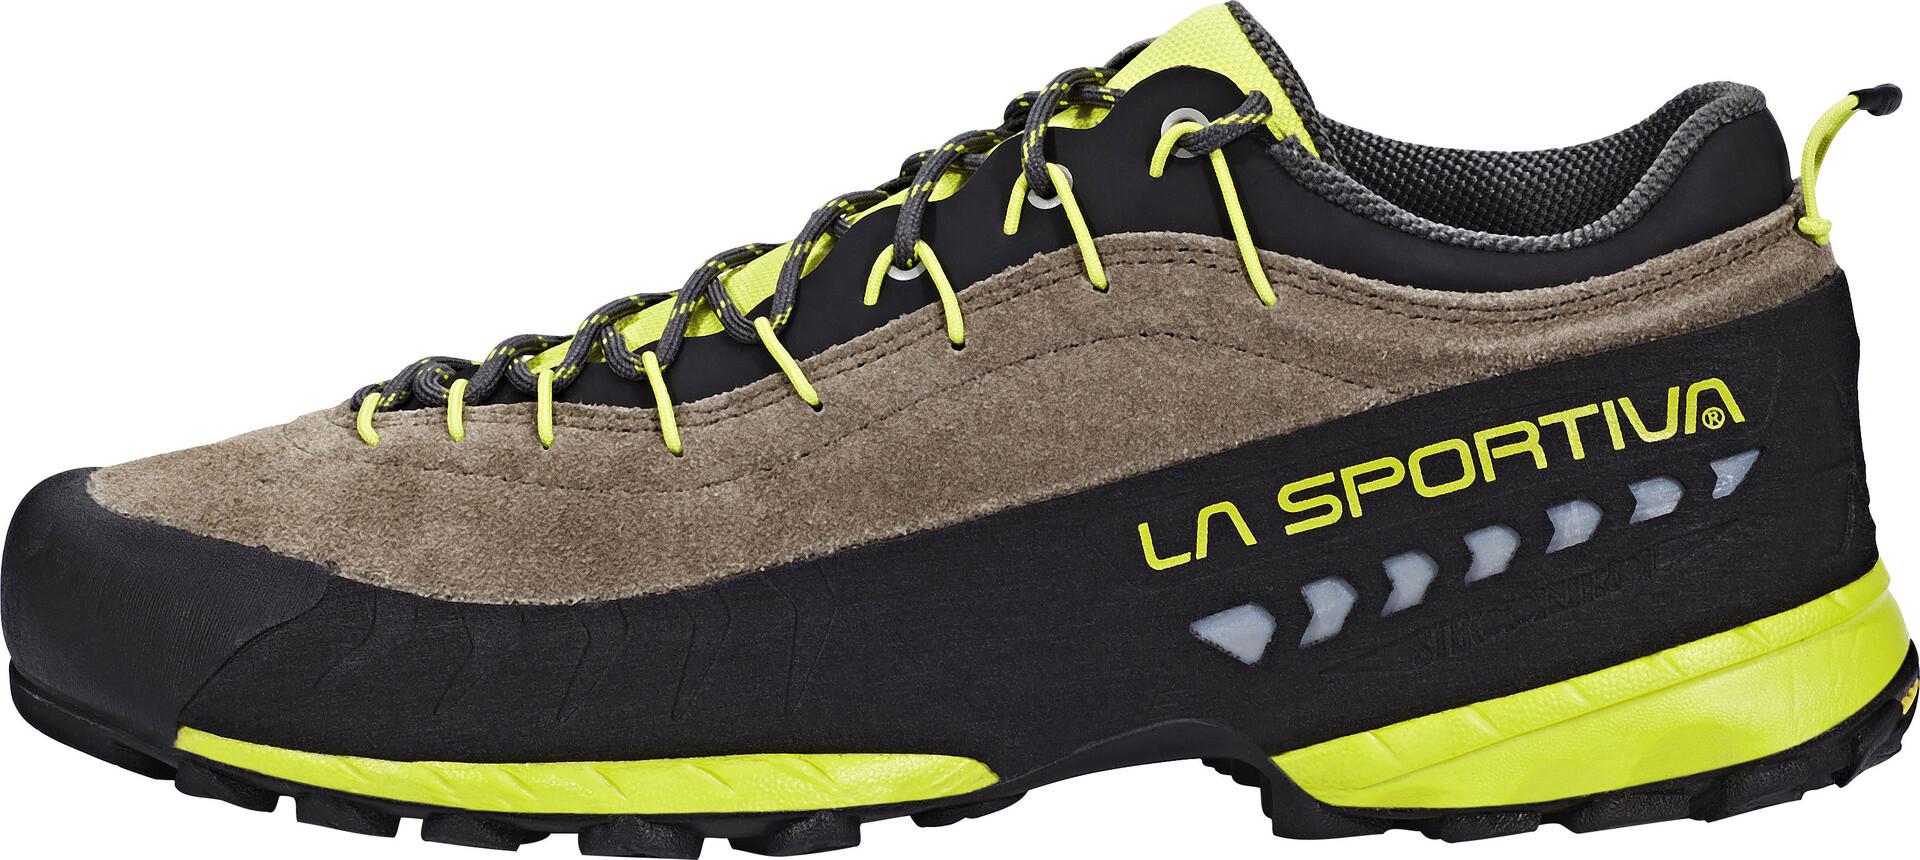 Sportiva La Taupesulphur Herren Tx4 Shoes CthrQdsx